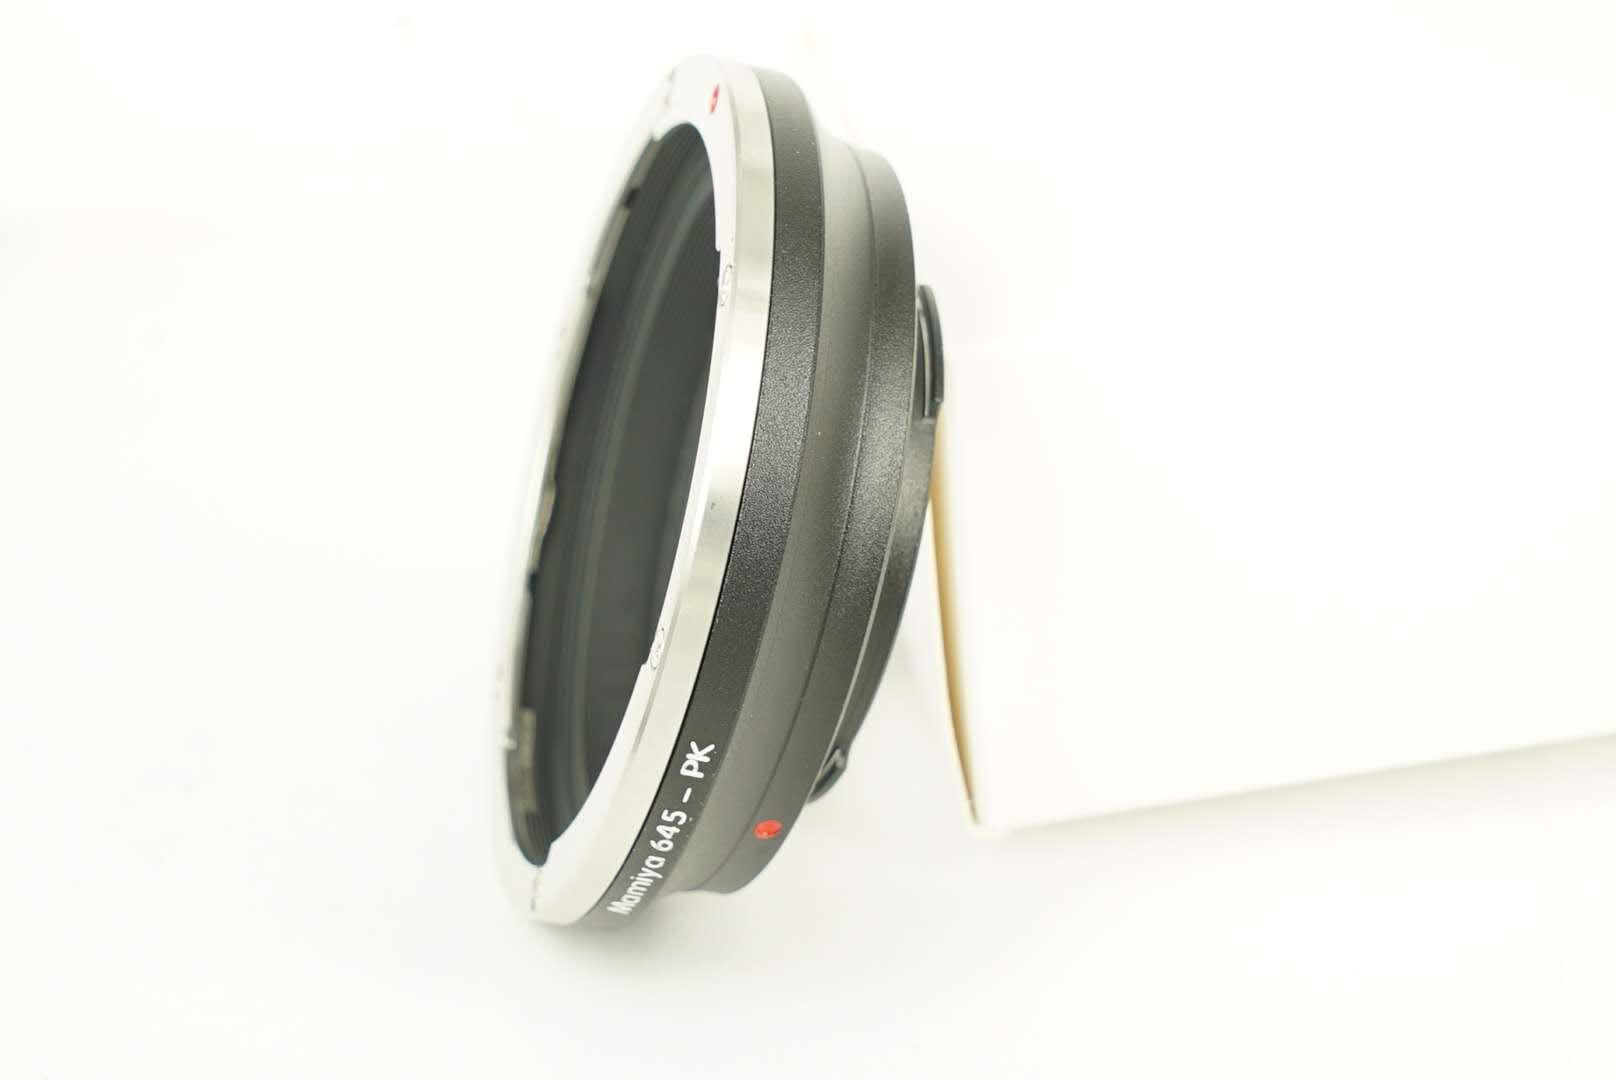 M645 Mamiya 645 Objektiv pentax pk kamera mount Adapter Ring für K10D K20D K200D K-5 K-7 K-M K-R K-X kamera